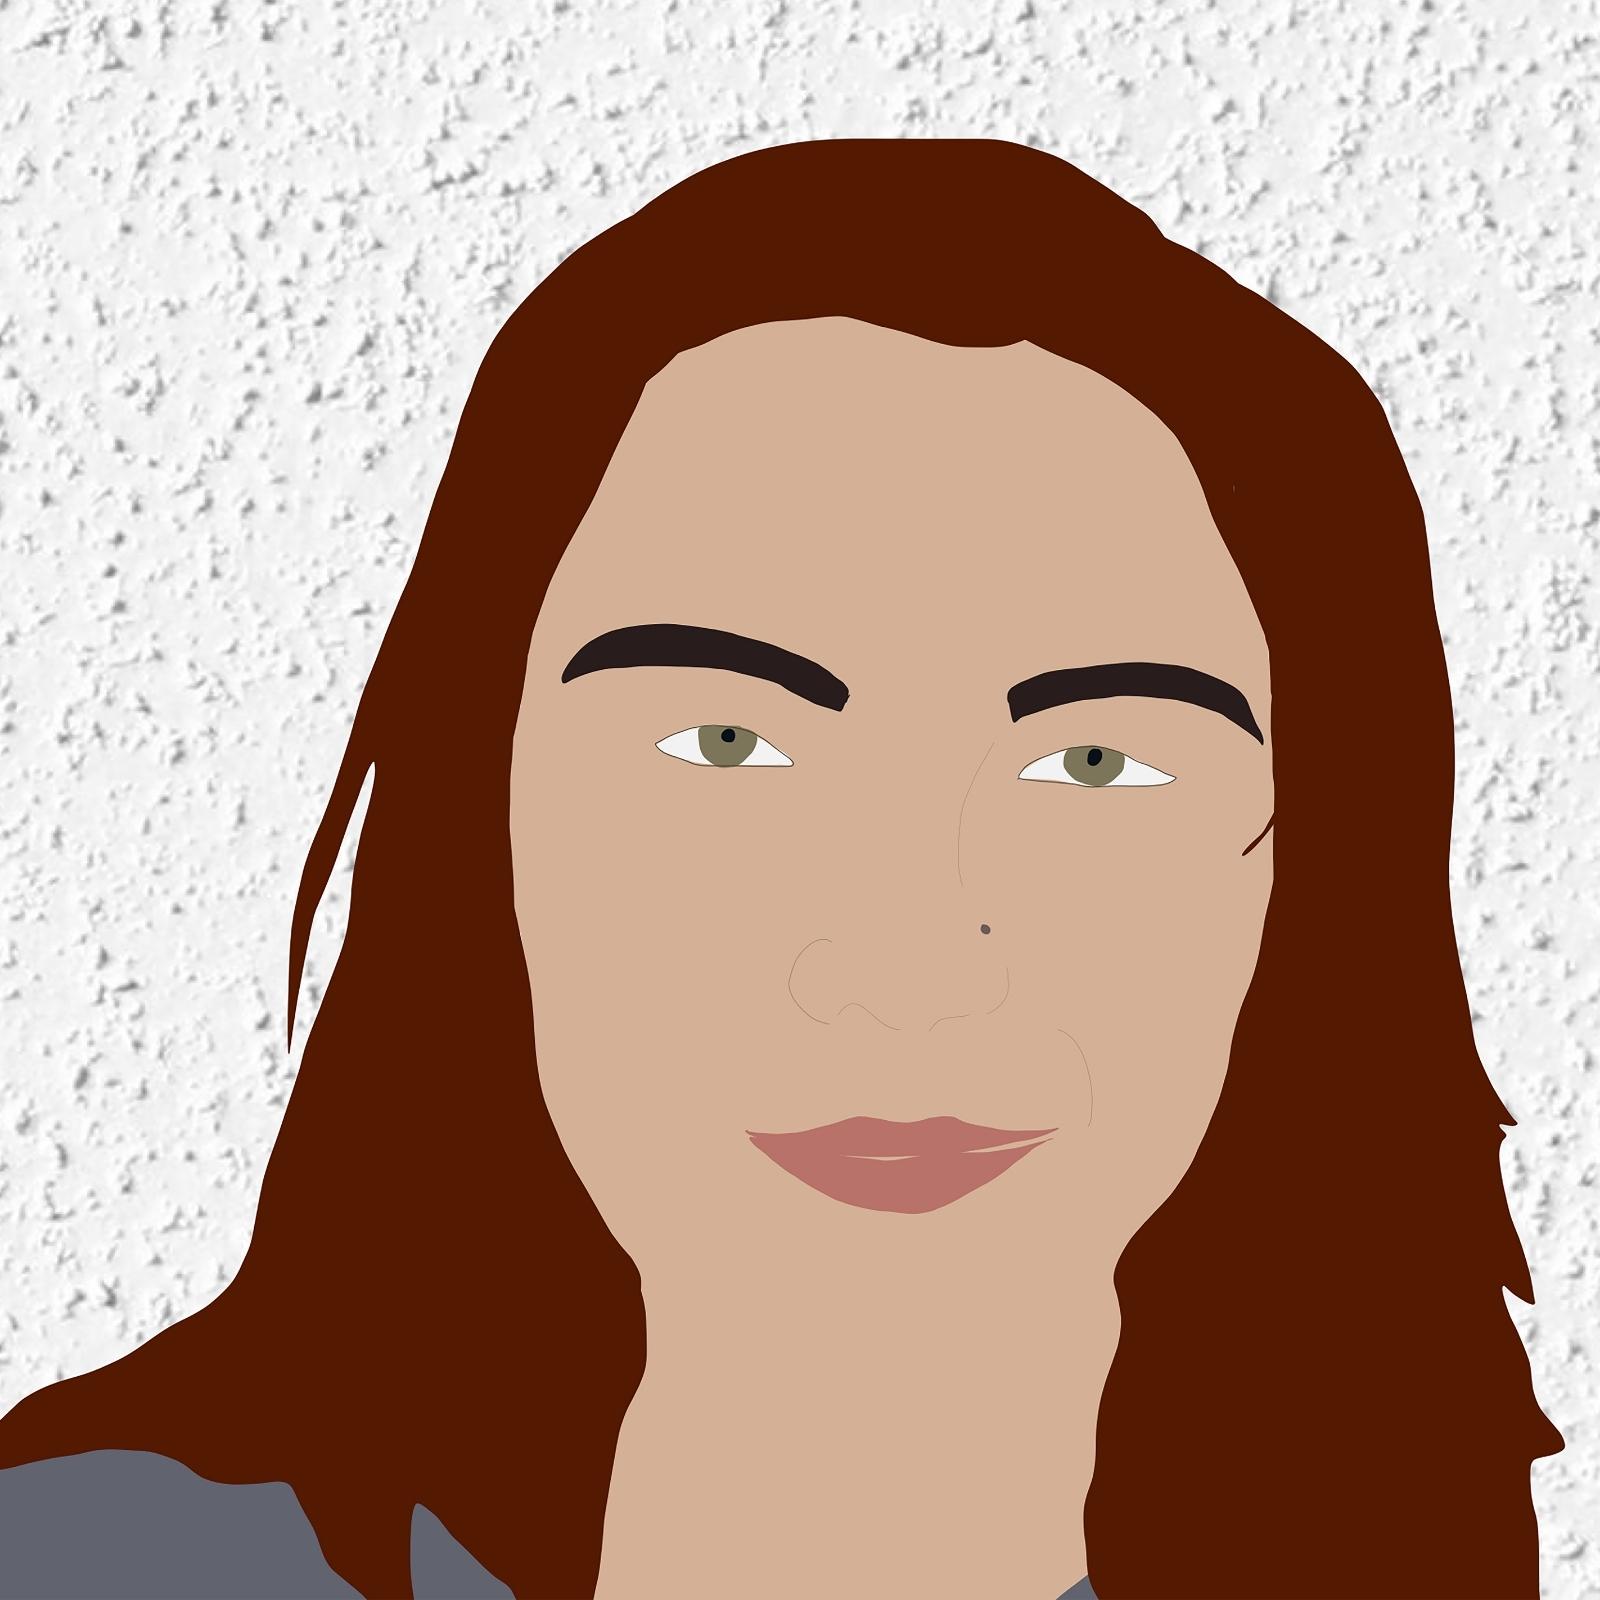 Digital illustration of Daniella smiling against a white stucco background.